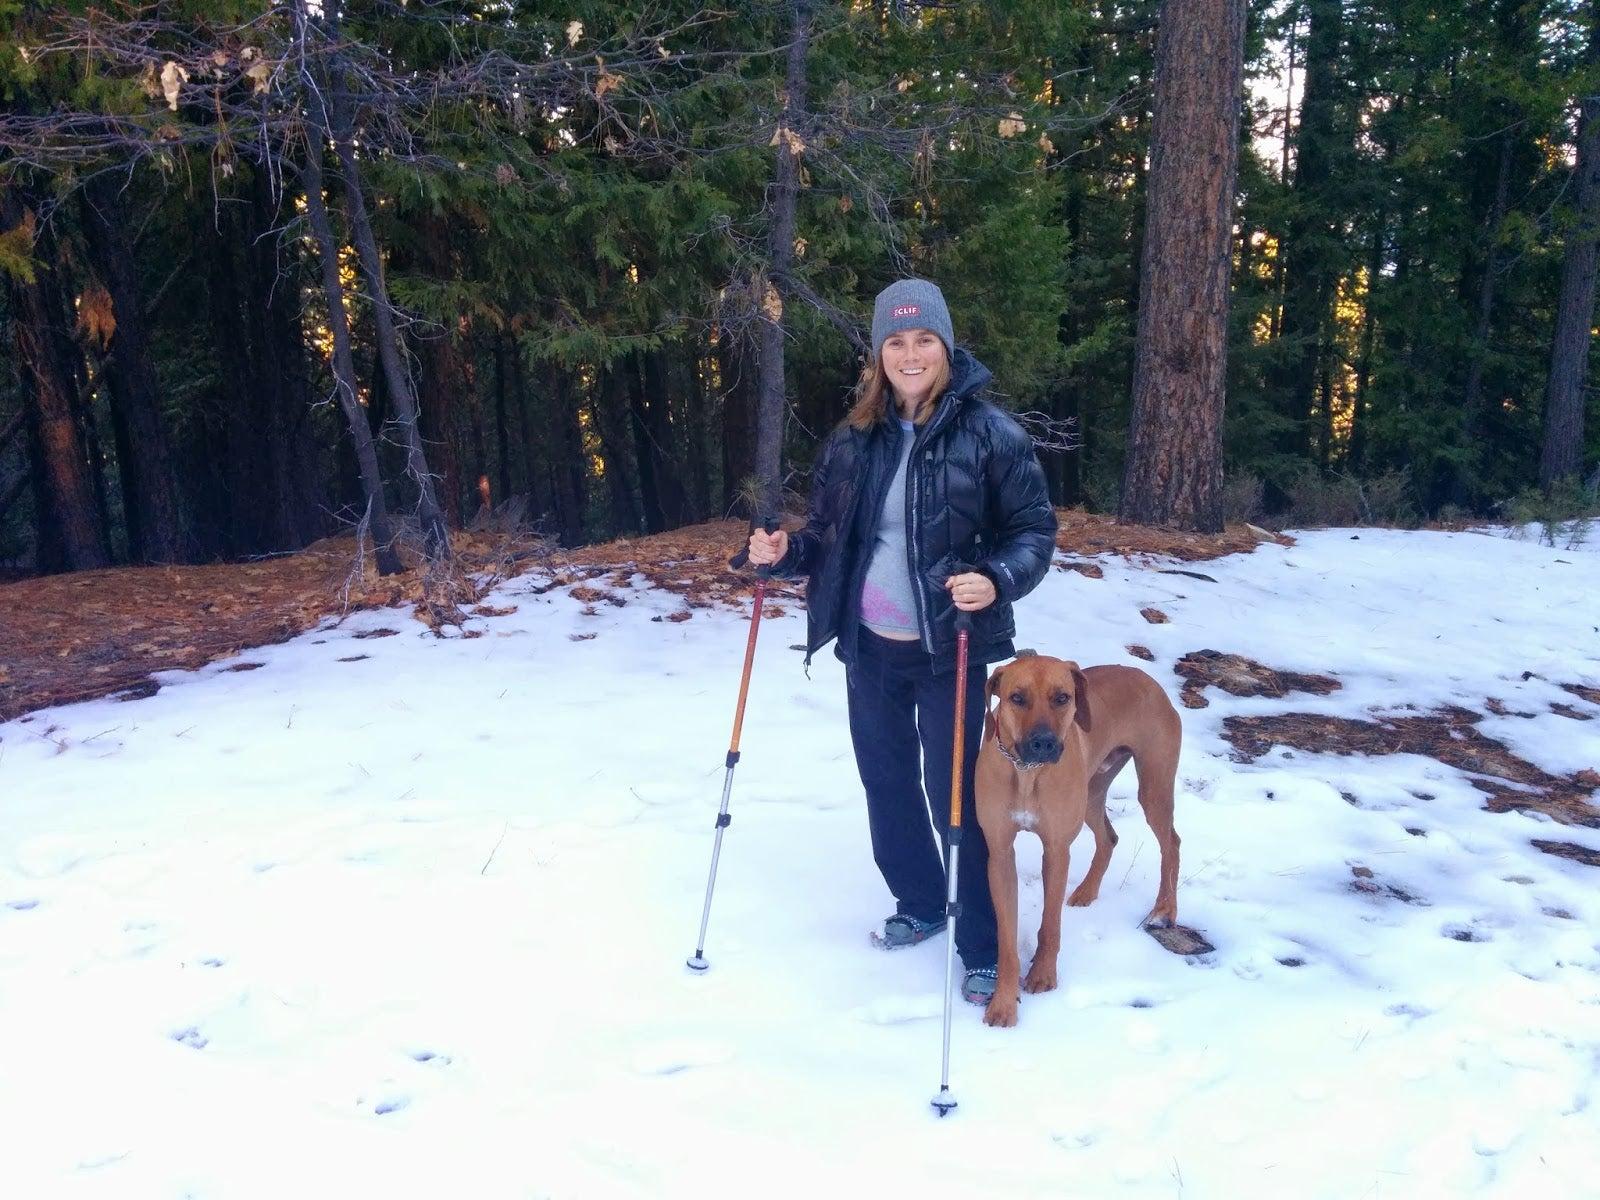 Climbing Through Pregnancy: Tradwalking, Falling And Getting Real